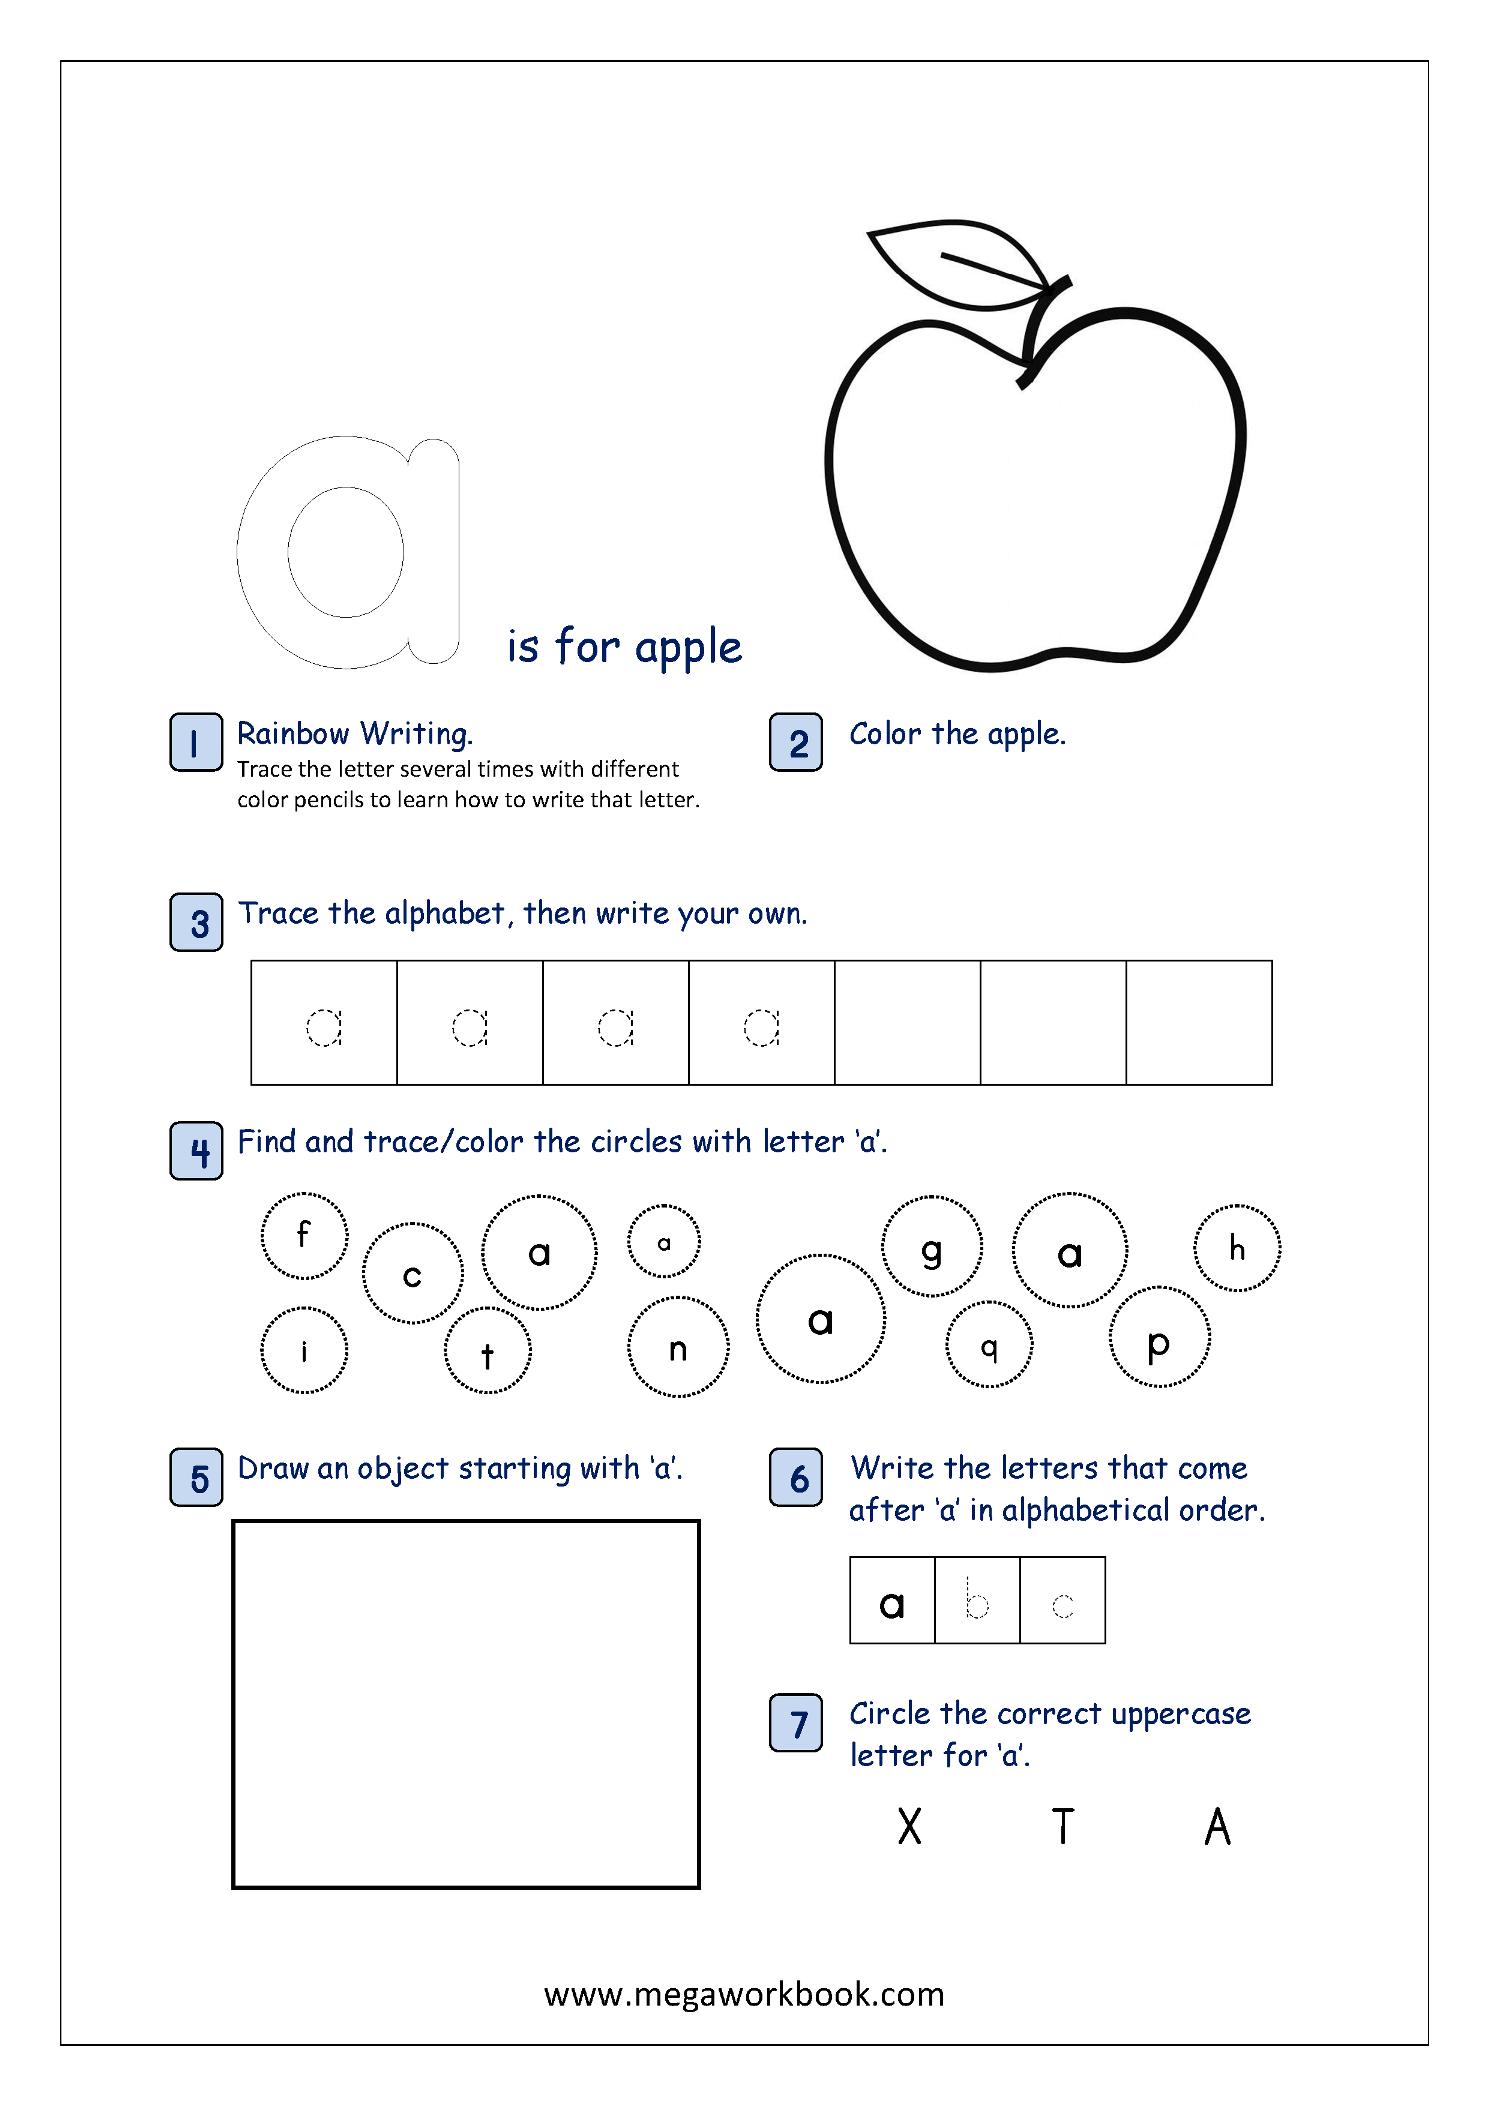 Free Printable Alphabet Recognition Worksheets For Small intended for Alphabet Recognition Worksheets